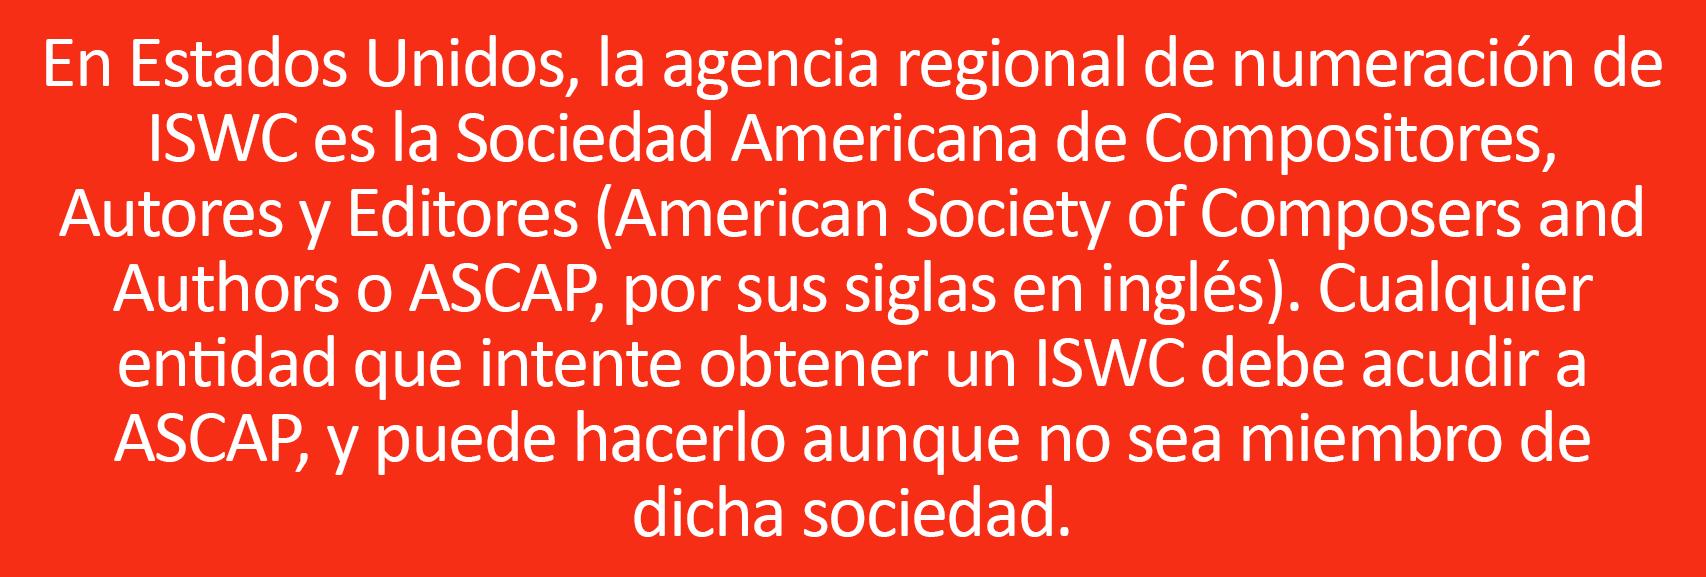 ISWC-pic-2-SP